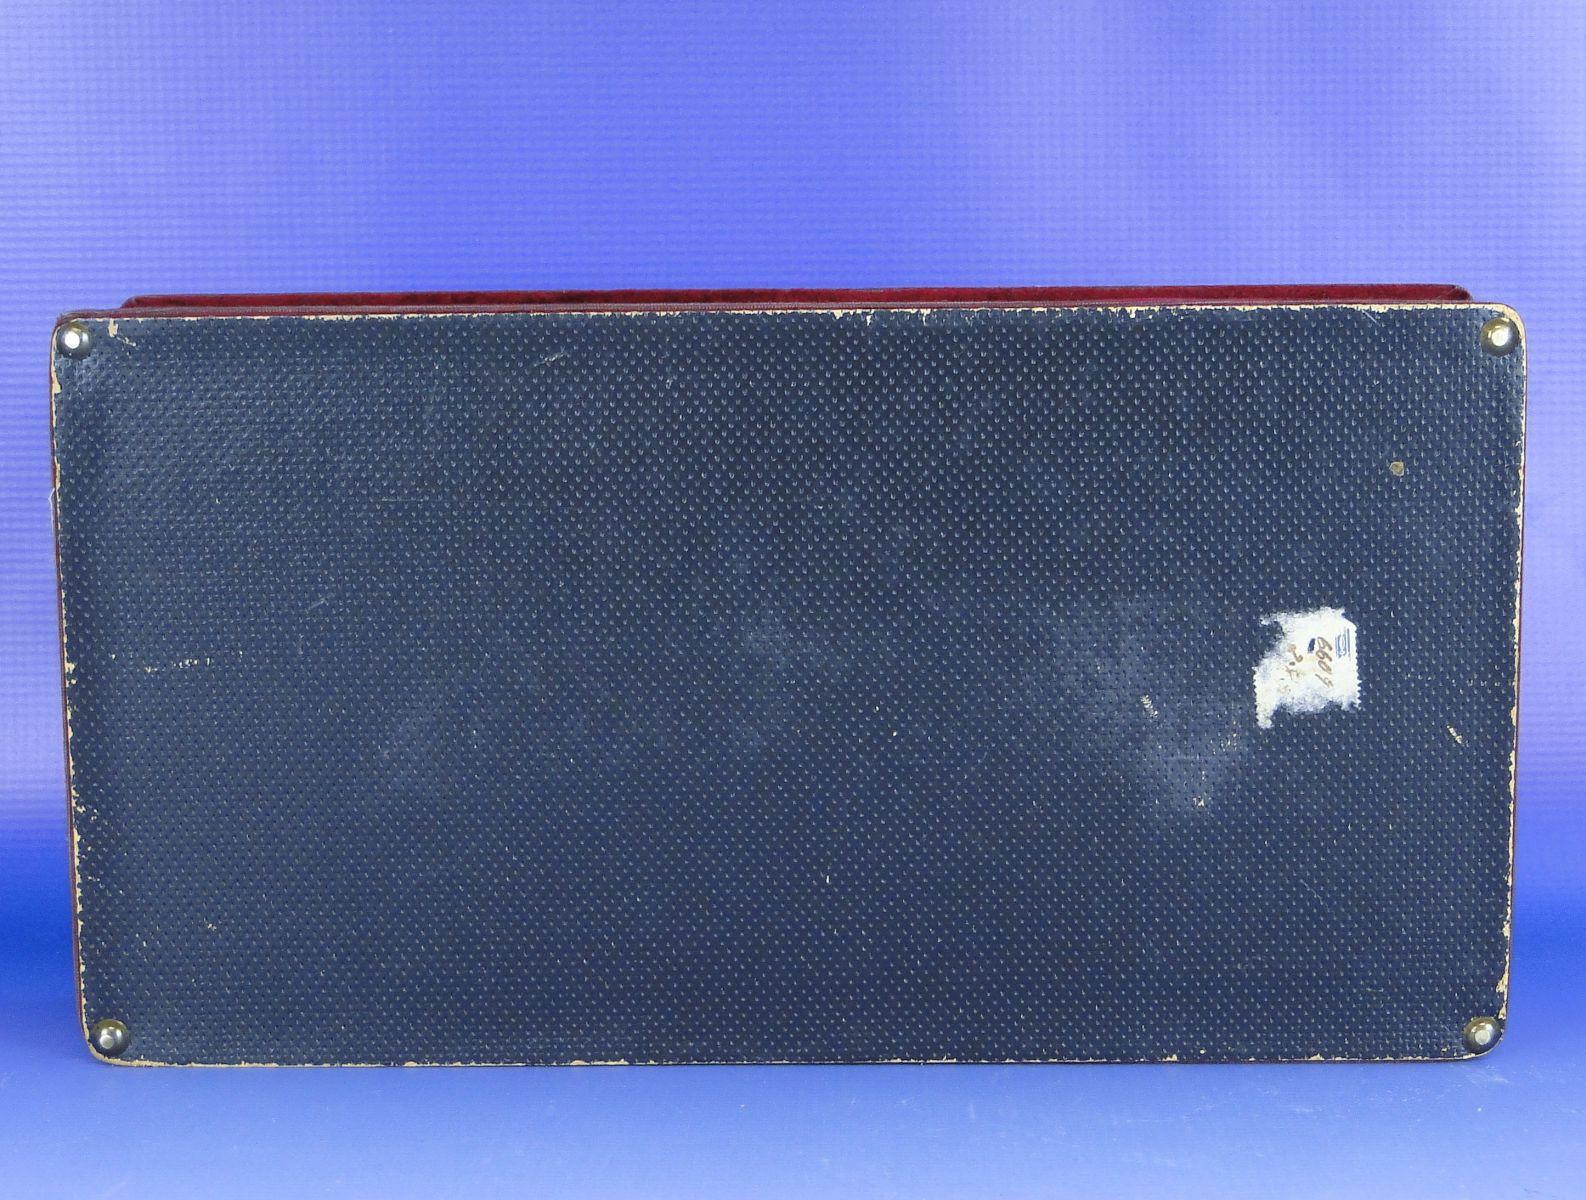 DSC03445.JPG (1586�1200)